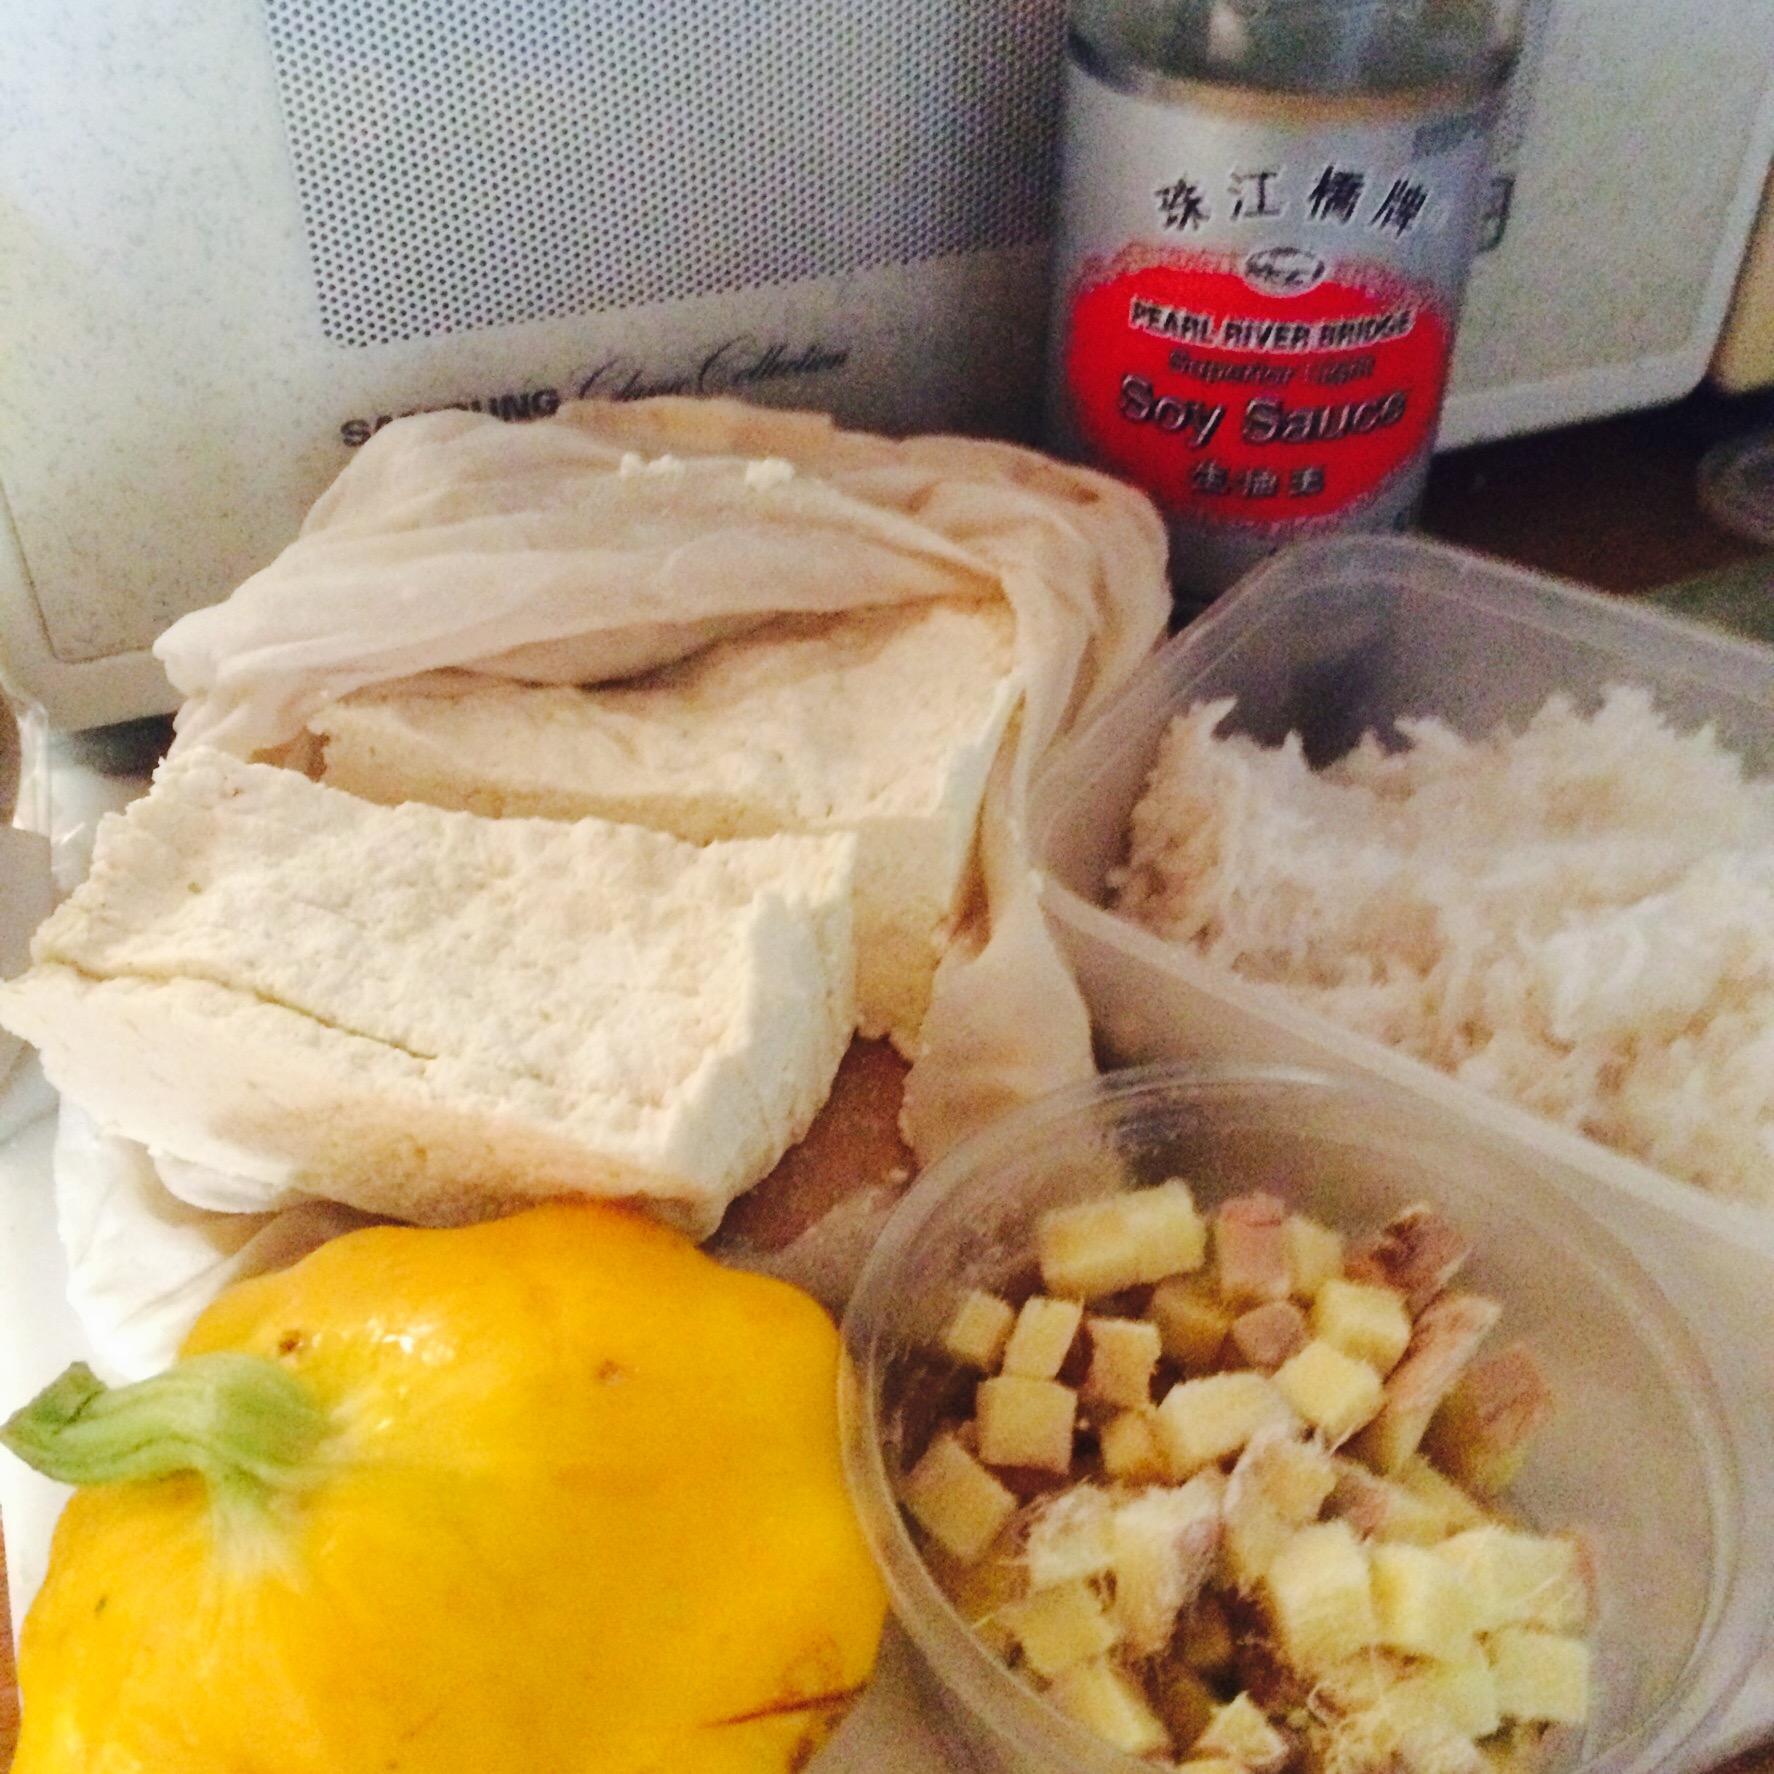 Ingredients ready to make yummy ginger and tofu rice | midorigreen.co.uk